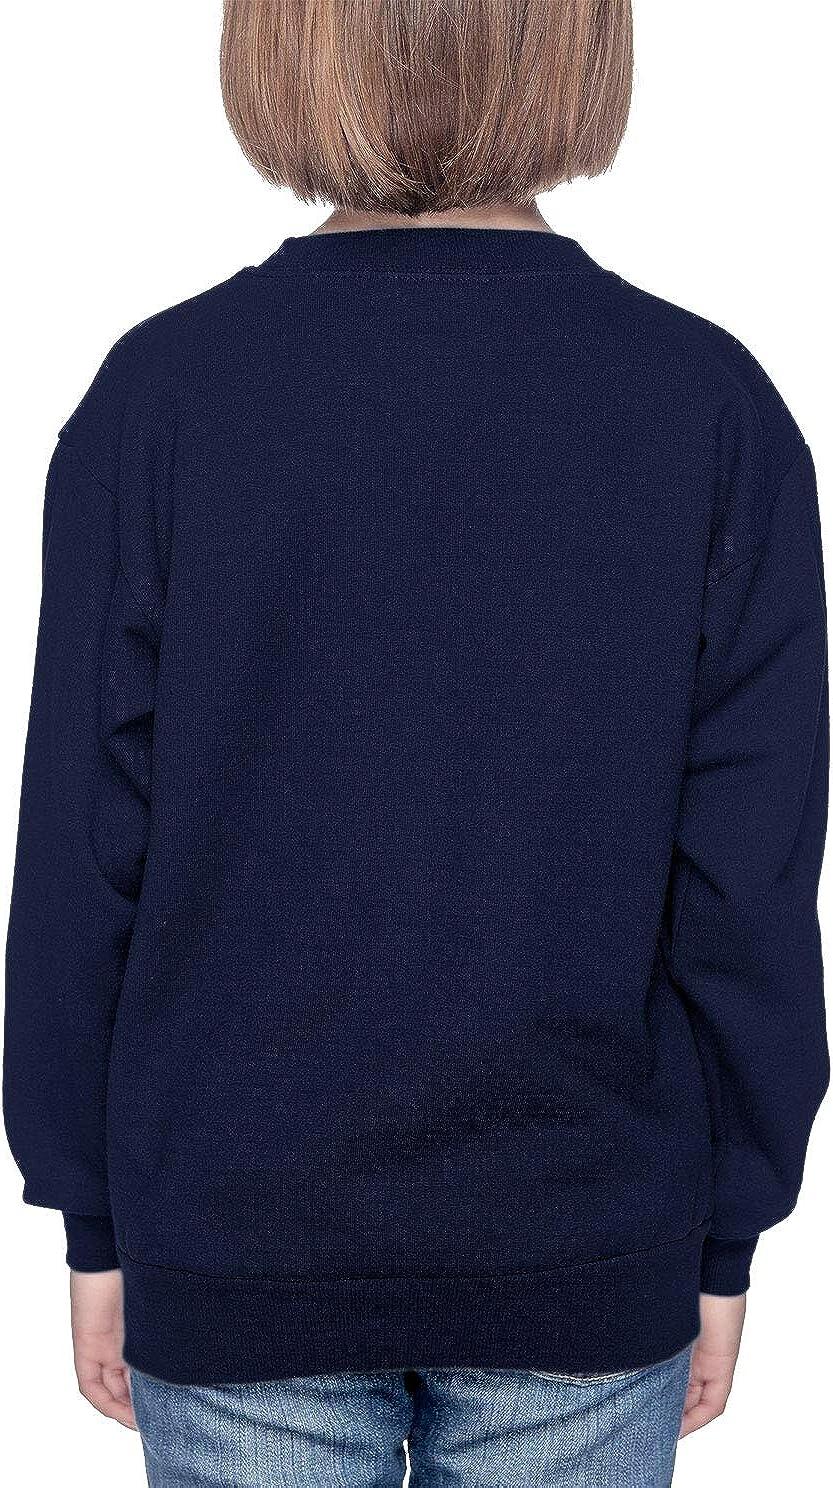 Navy Blue, Medium HAASE UNLIMITED Hello 3rd Grade Back to School Youth Fleece Crewneck Sweater